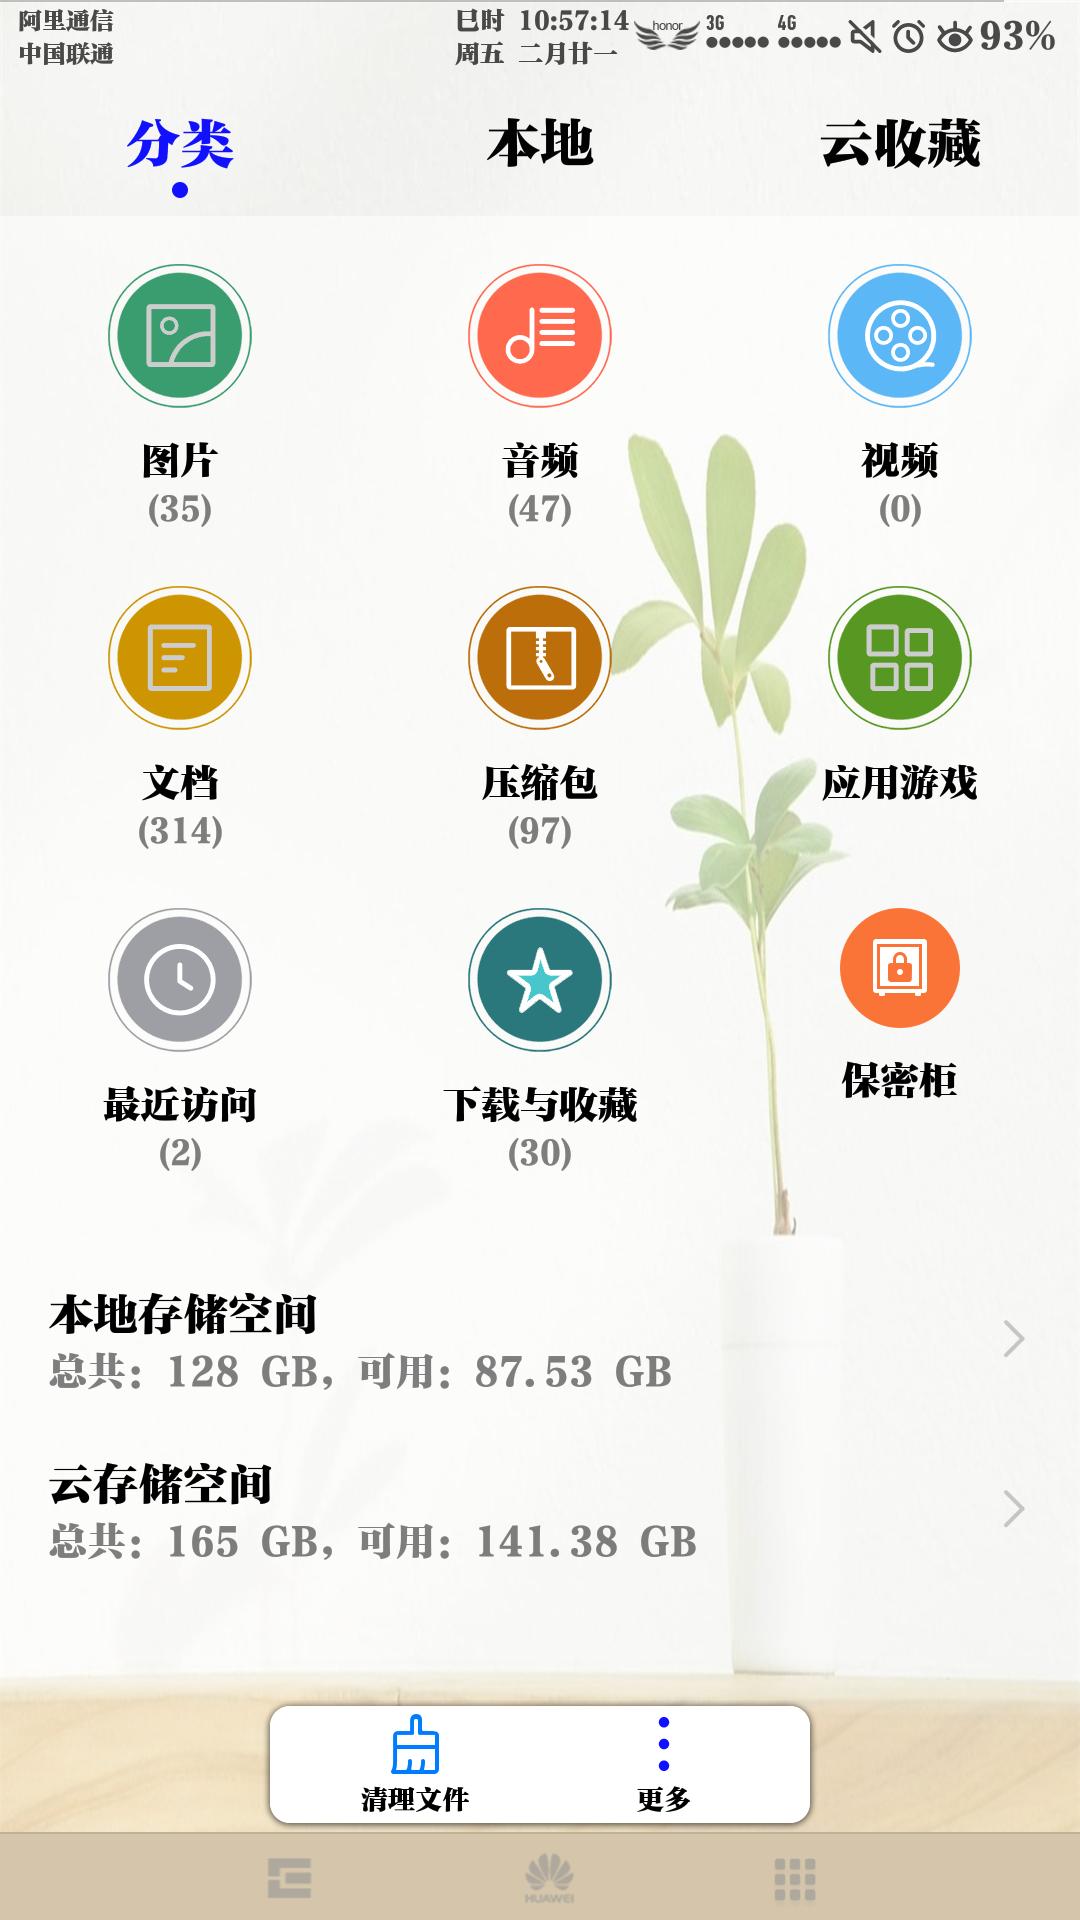 Screenshot_2018-04-06-10-57-16.png